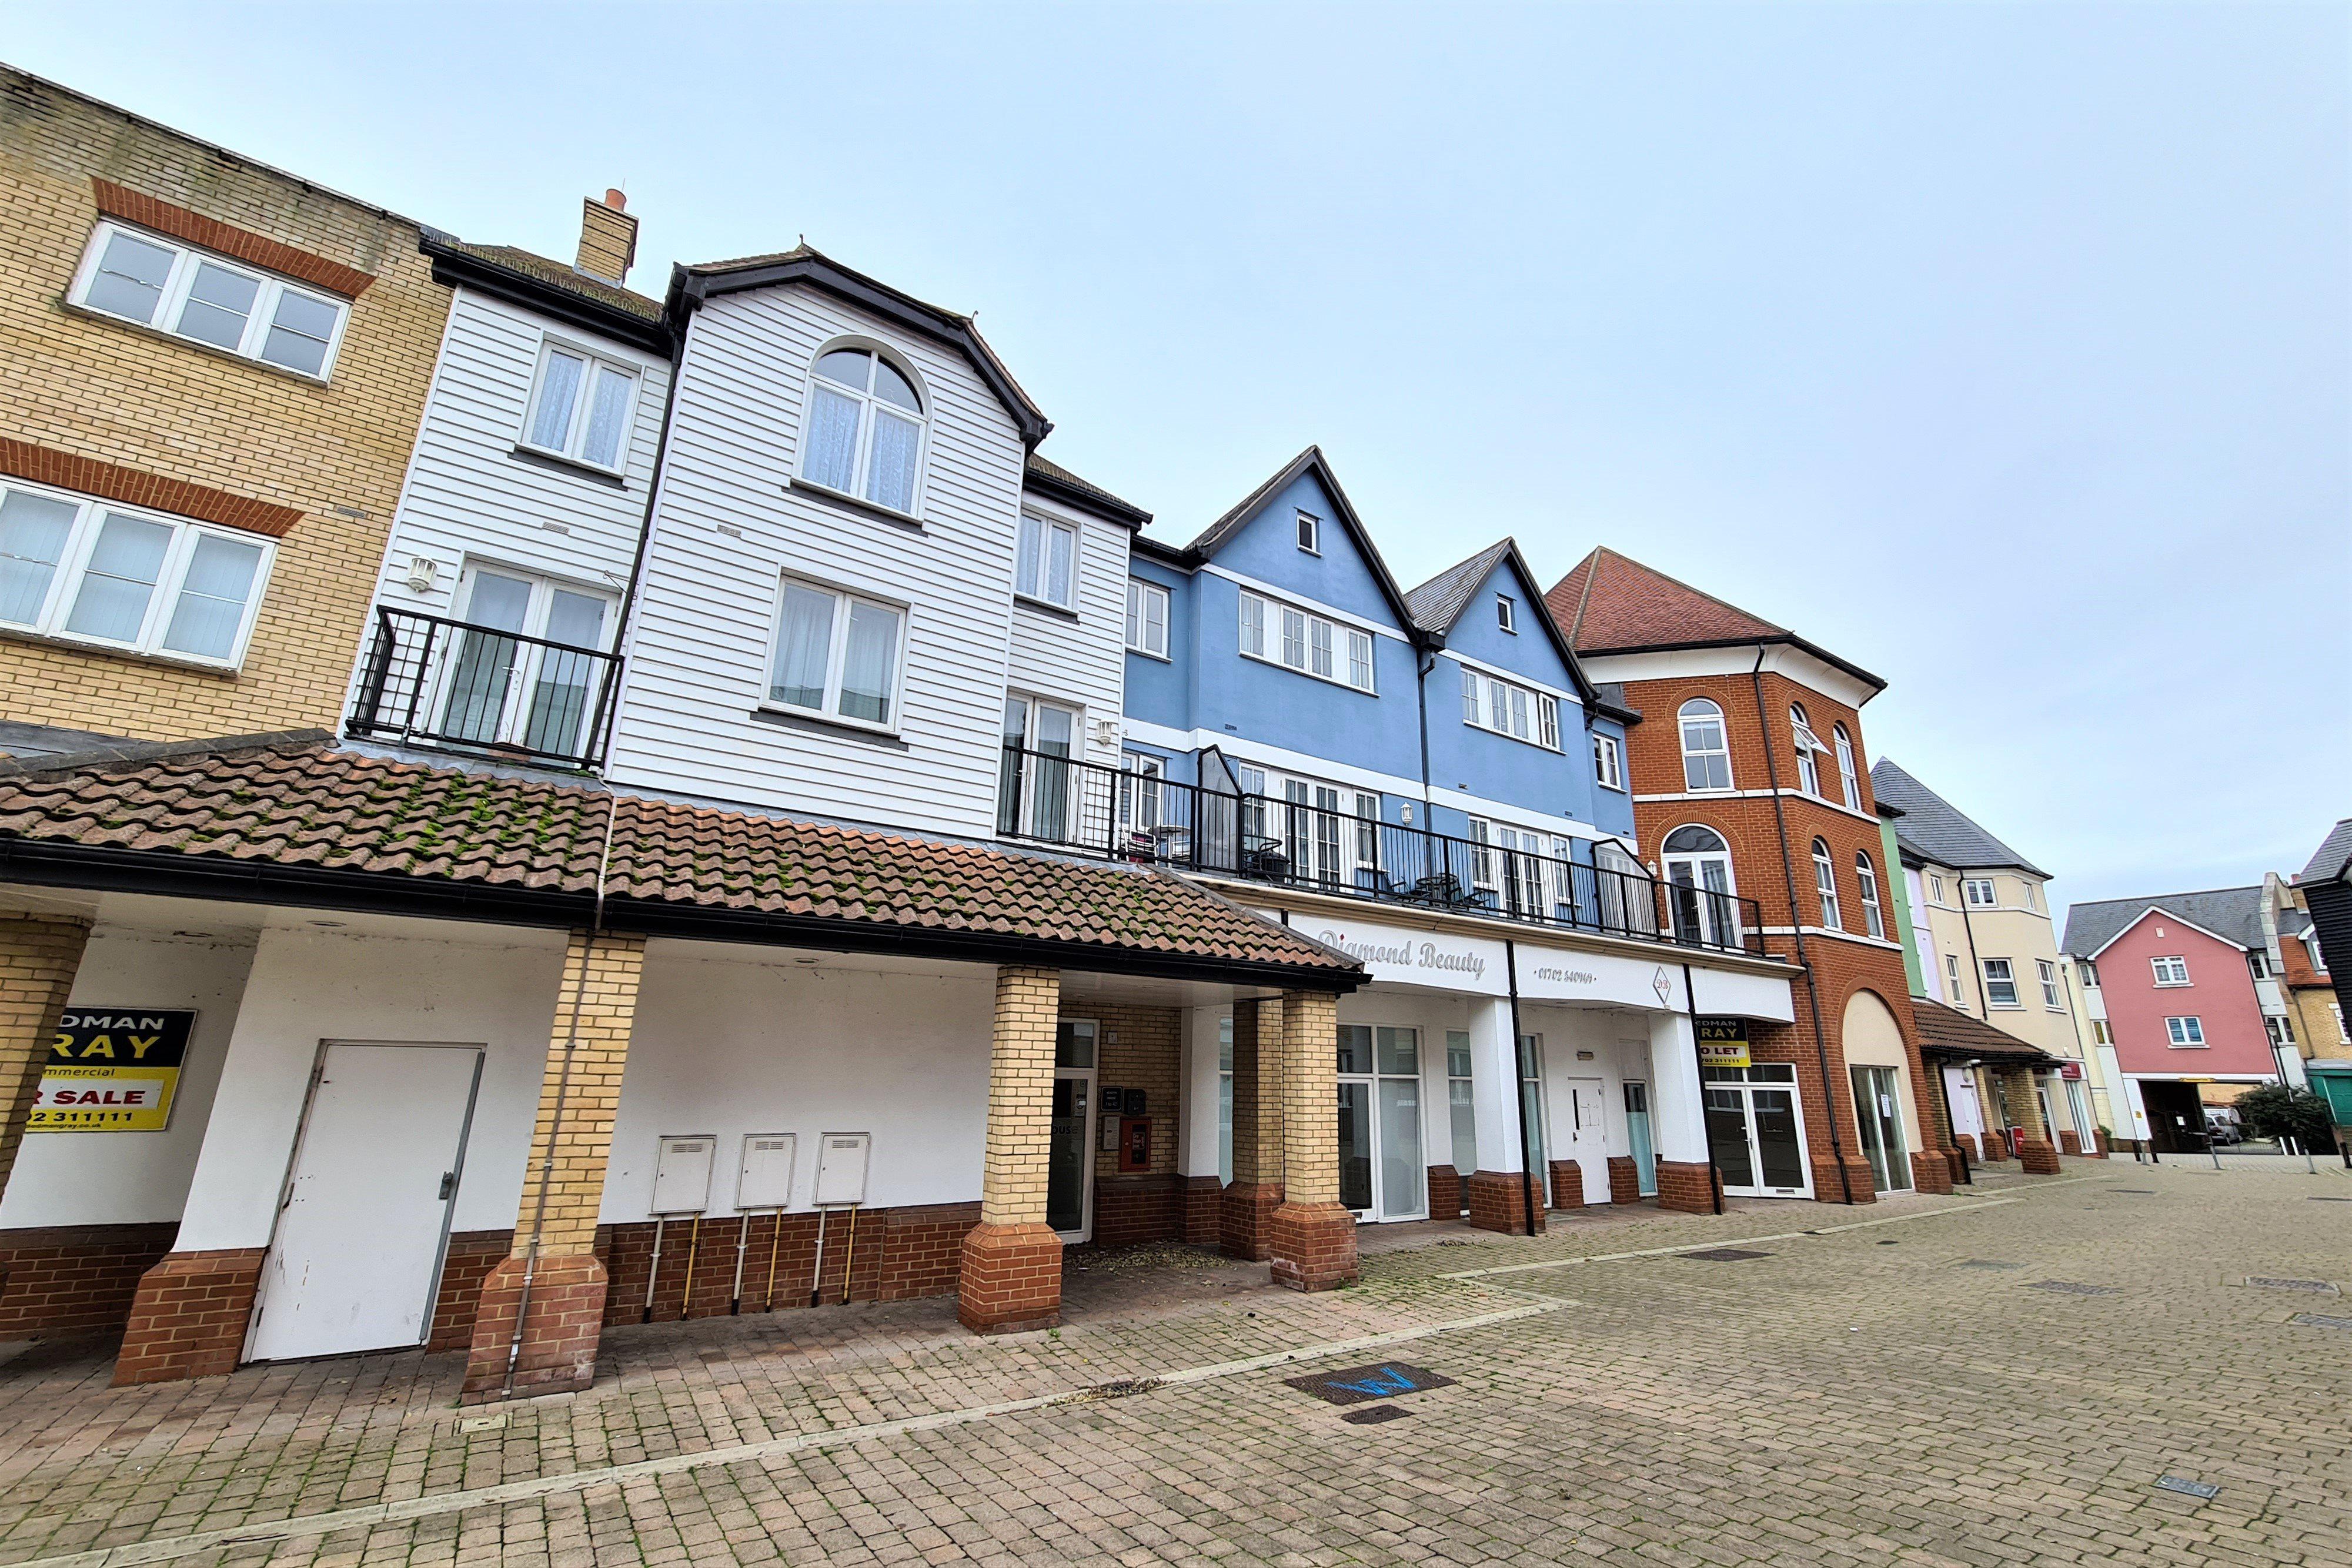 1 bed flat for sale in Boleyn House, Rochford, SS4